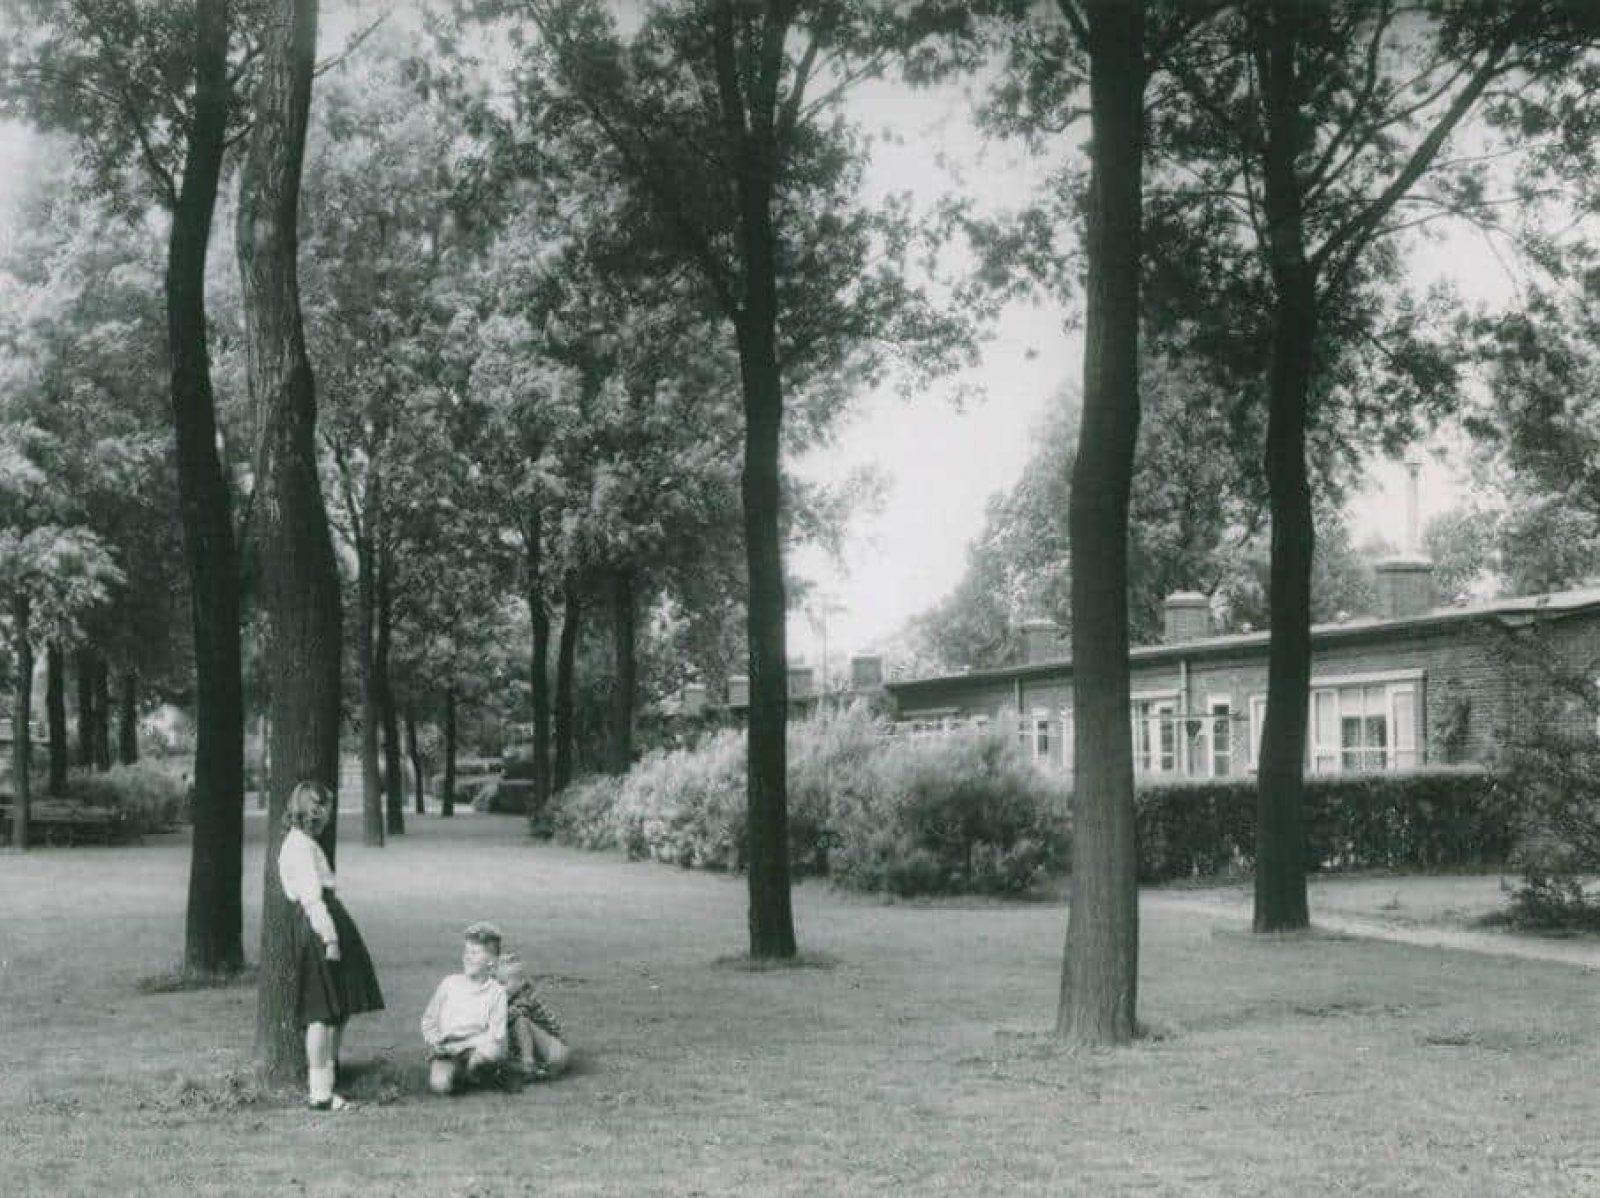 Wielewaal-1958-Stadsarchief-OW